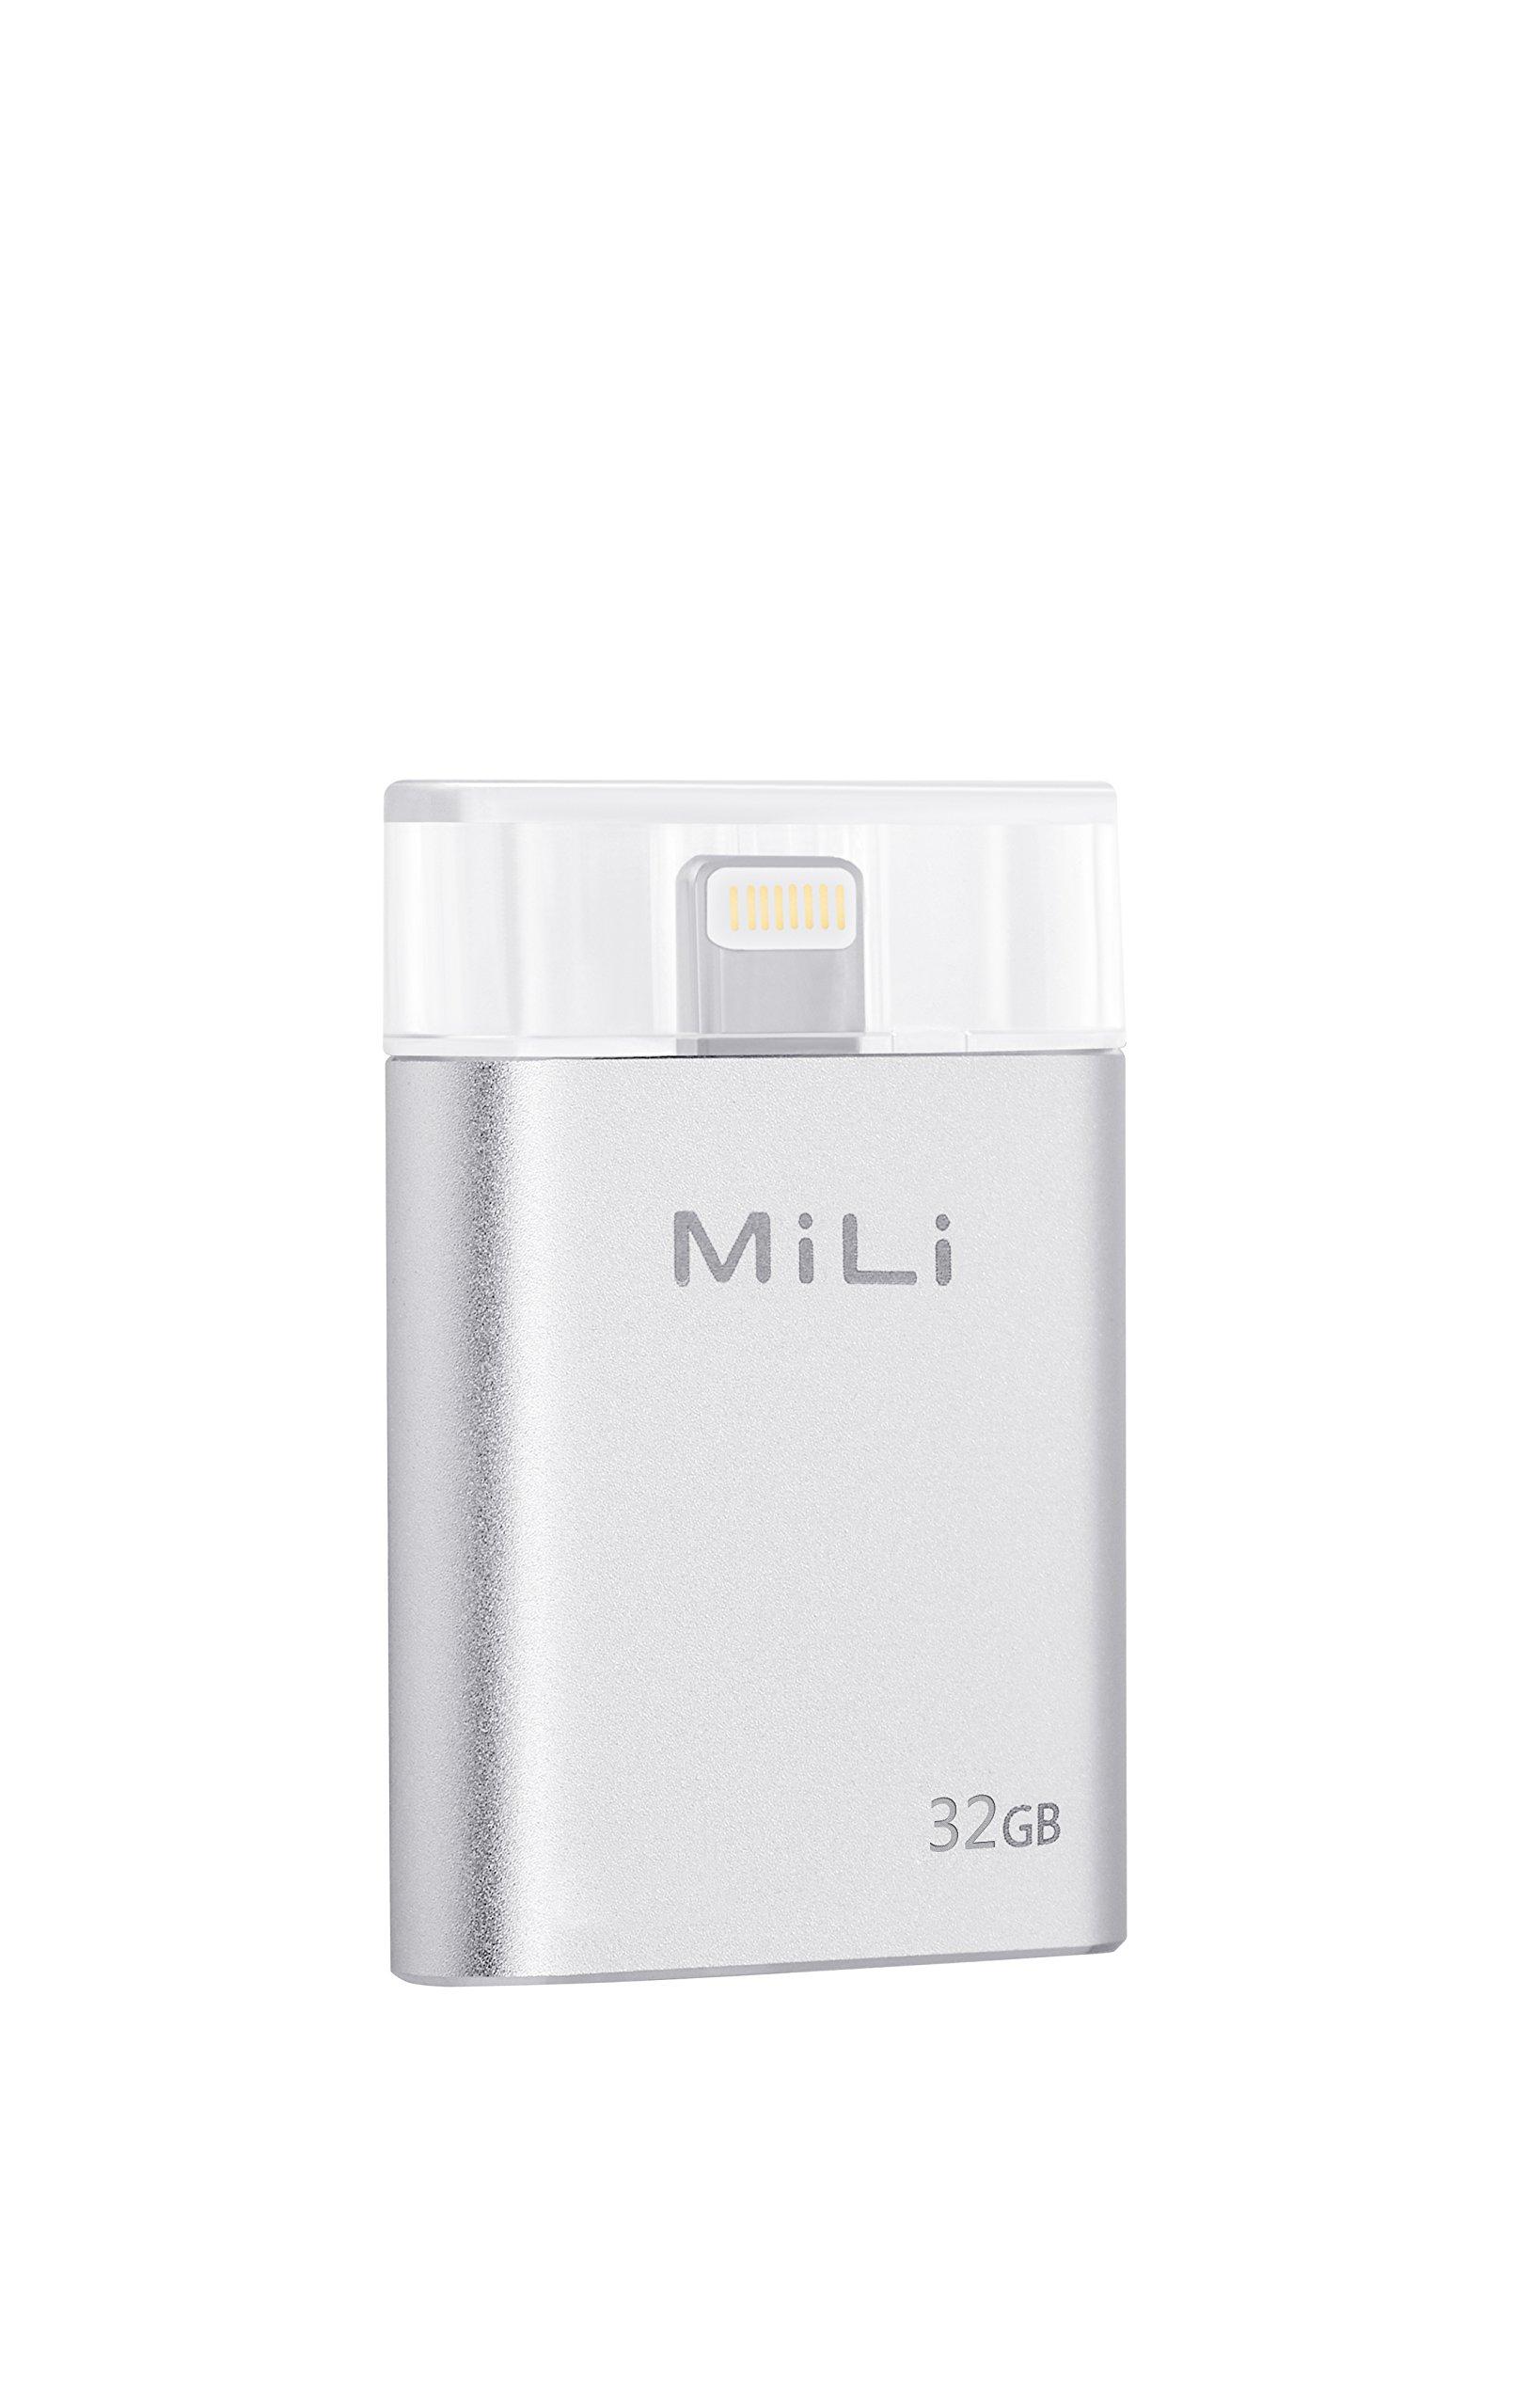 USB Flash Drive [Apple MFi Certified] MiLi iData 32G Portable Storage USB Flash Drive Specialized for iphone 6/6 plus/5/5s/5c/ipad 4/ipad mini/i Mac/ipod With Lightning Device